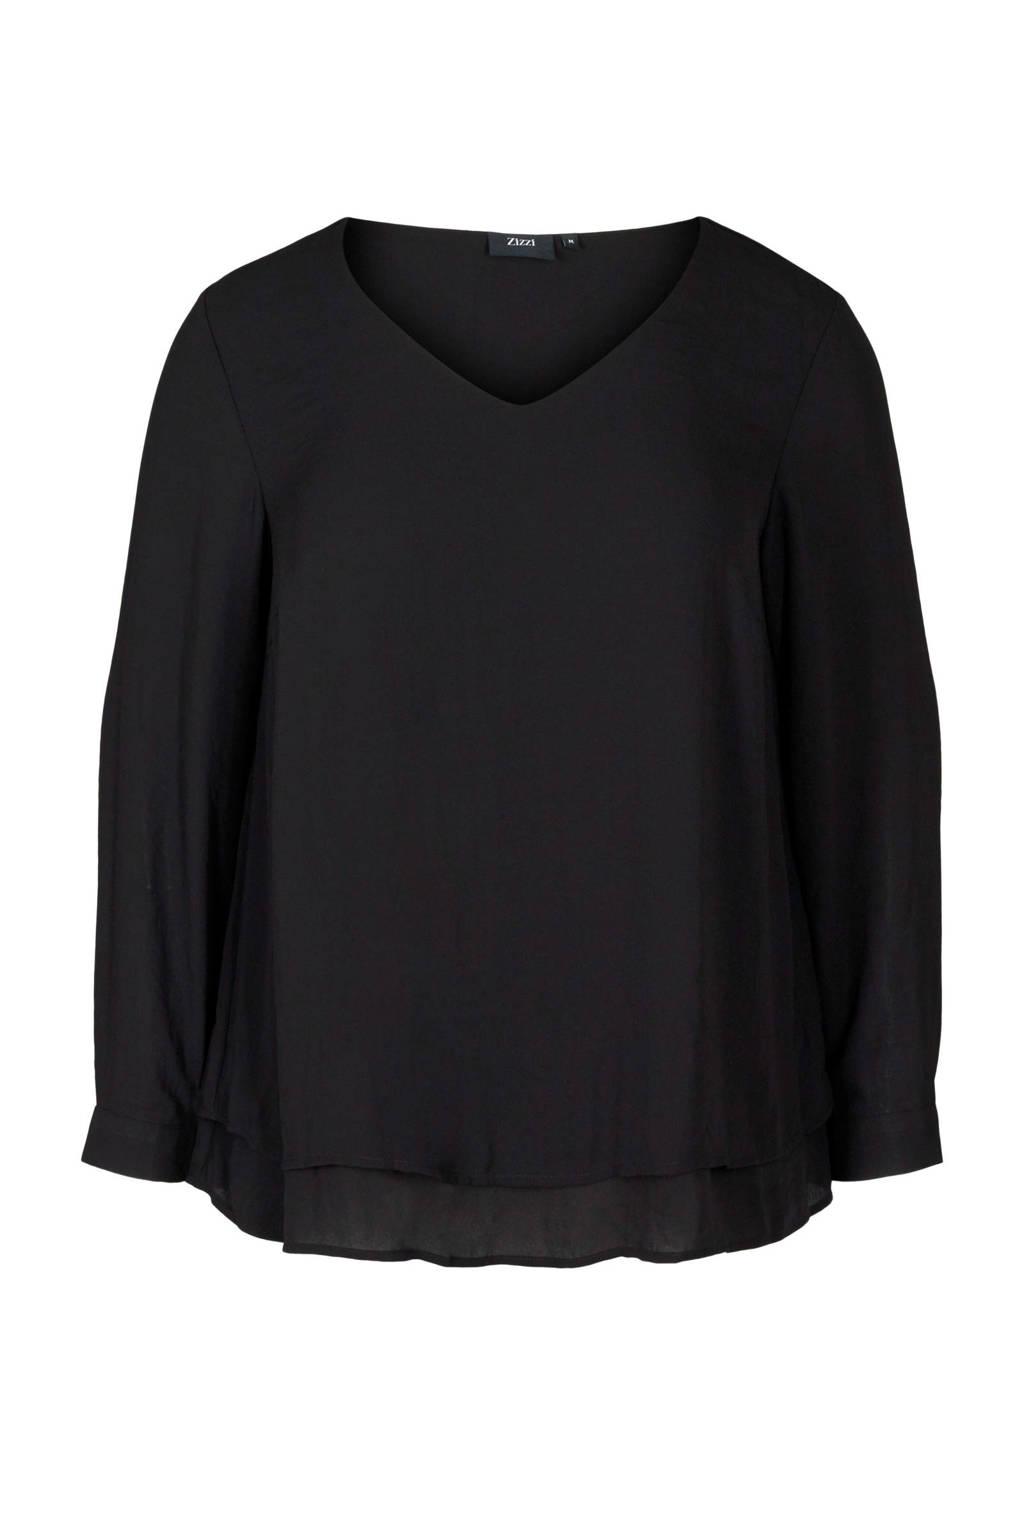 Zizzi semi-transparante blouse met ruches zwart, Zwart